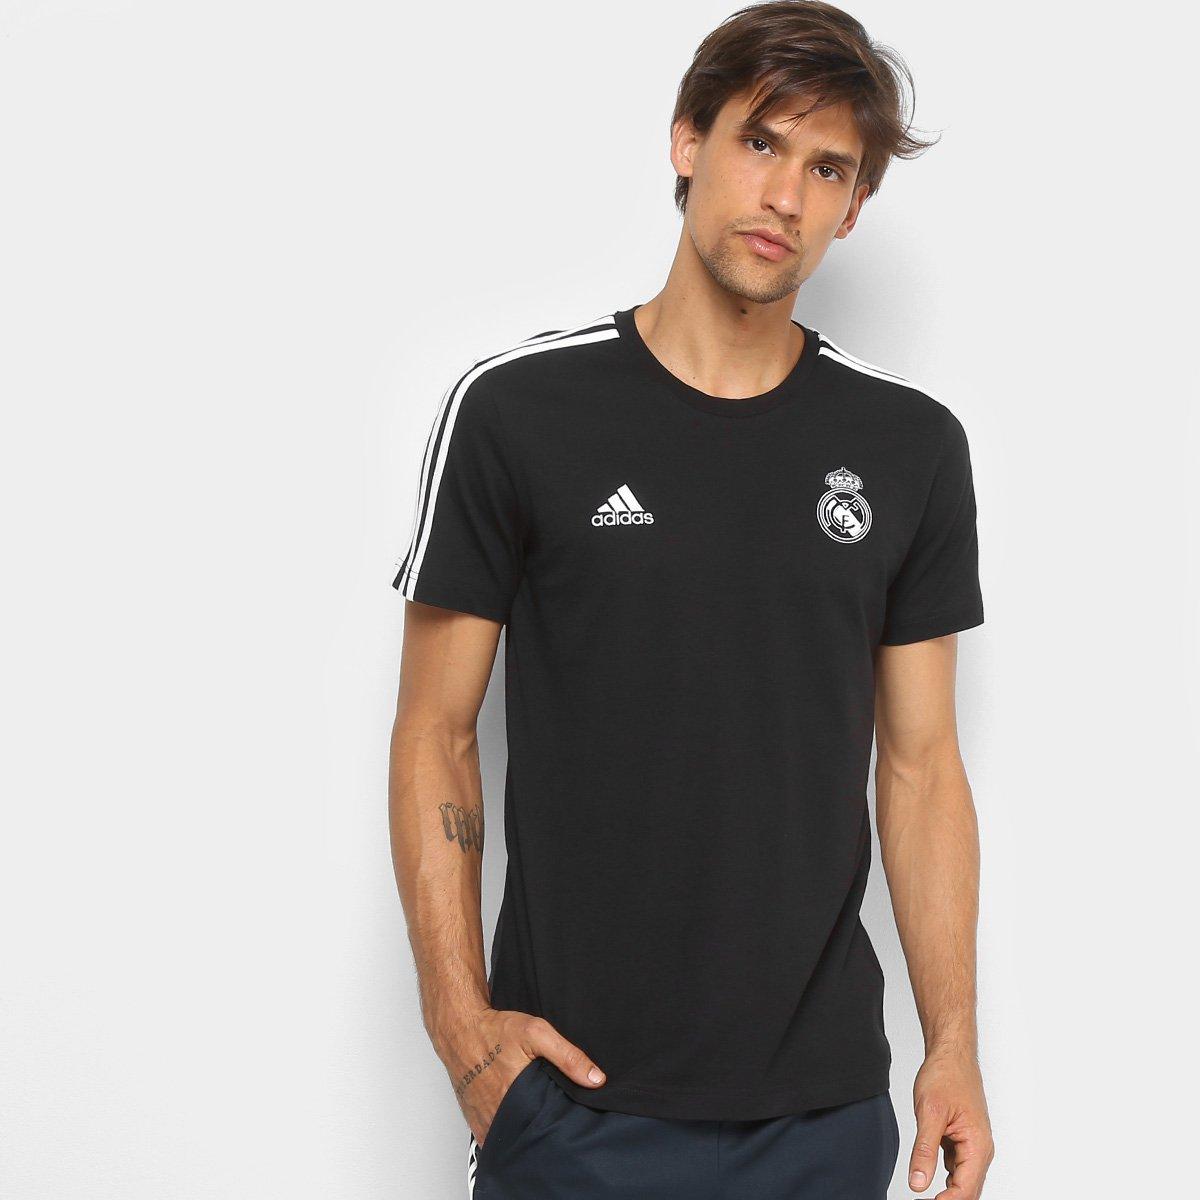 73fd71775b Camiseta Real Madrid 3Stripes Adidas Masculina - Preto e Branco ...